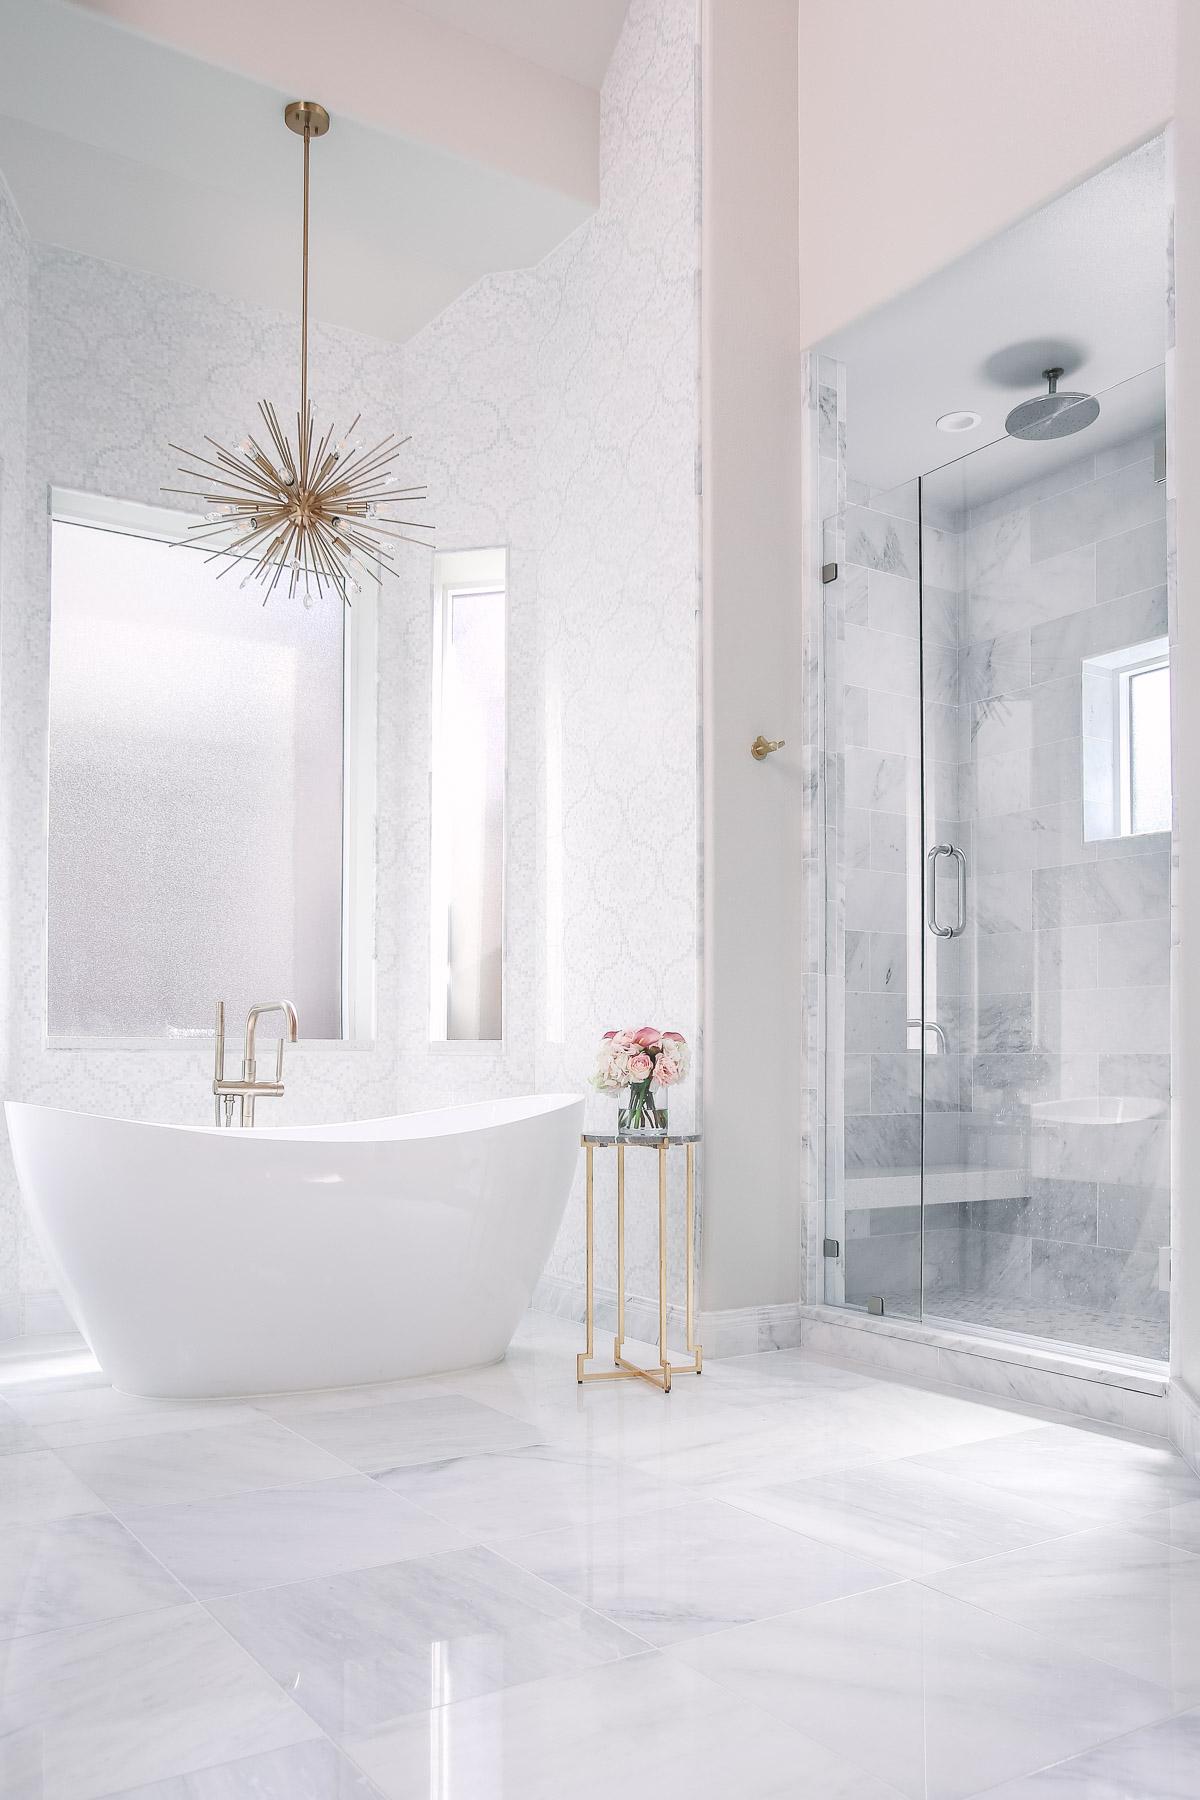 bathroom-renovation-with-soaking-tub.jpg